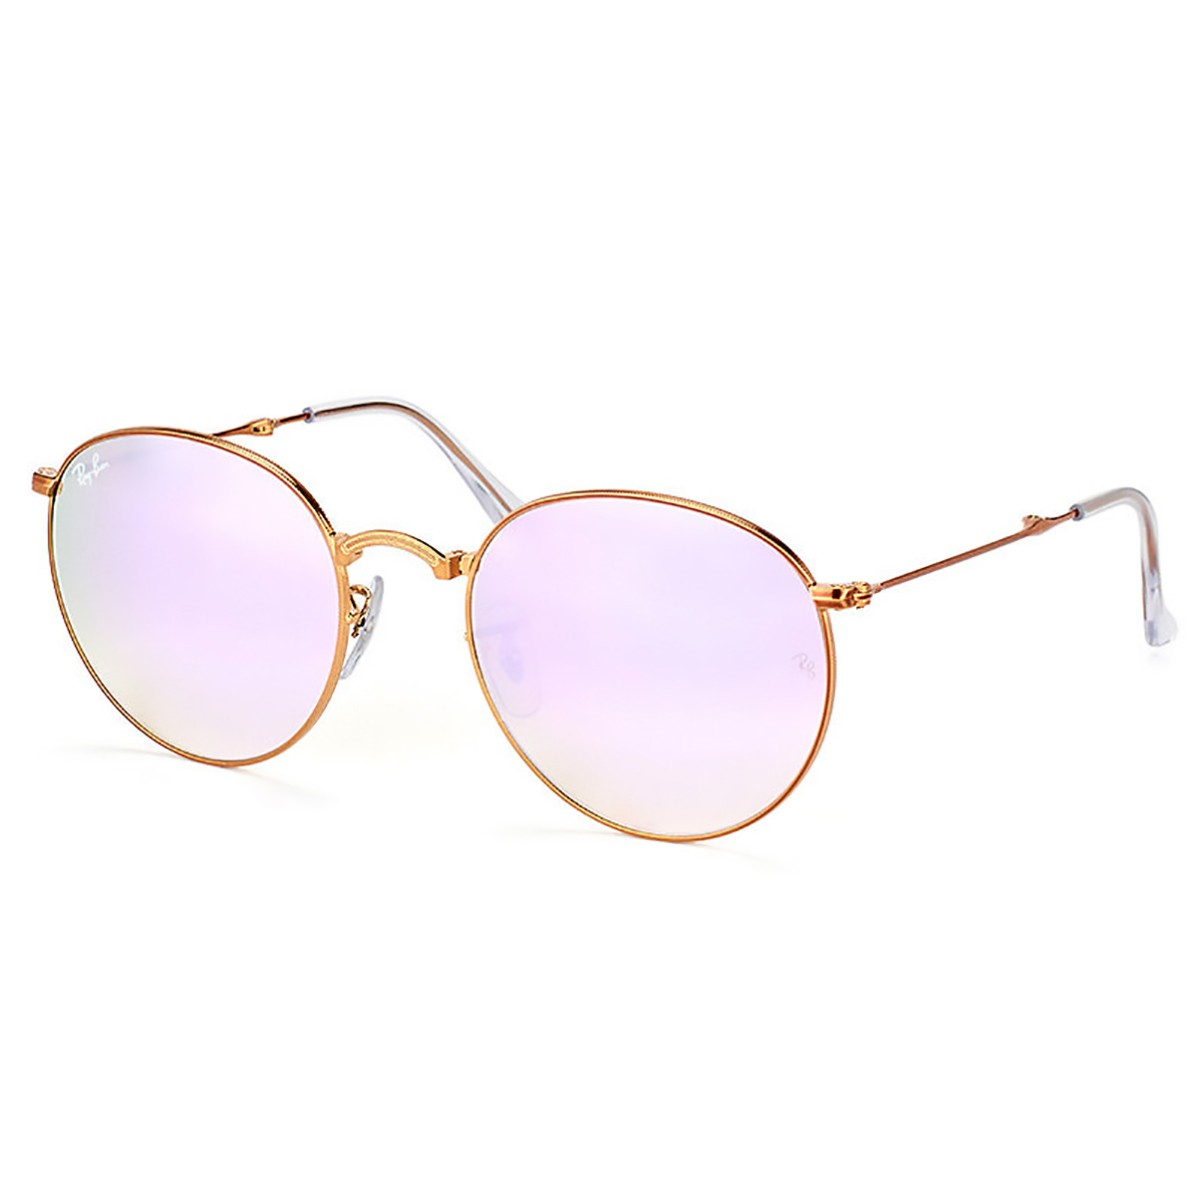 efaa601b3d8eb Compre Óculos de Sol Ray Ban Round Metal Dobrável em 10X   Tri-Jóia Shop